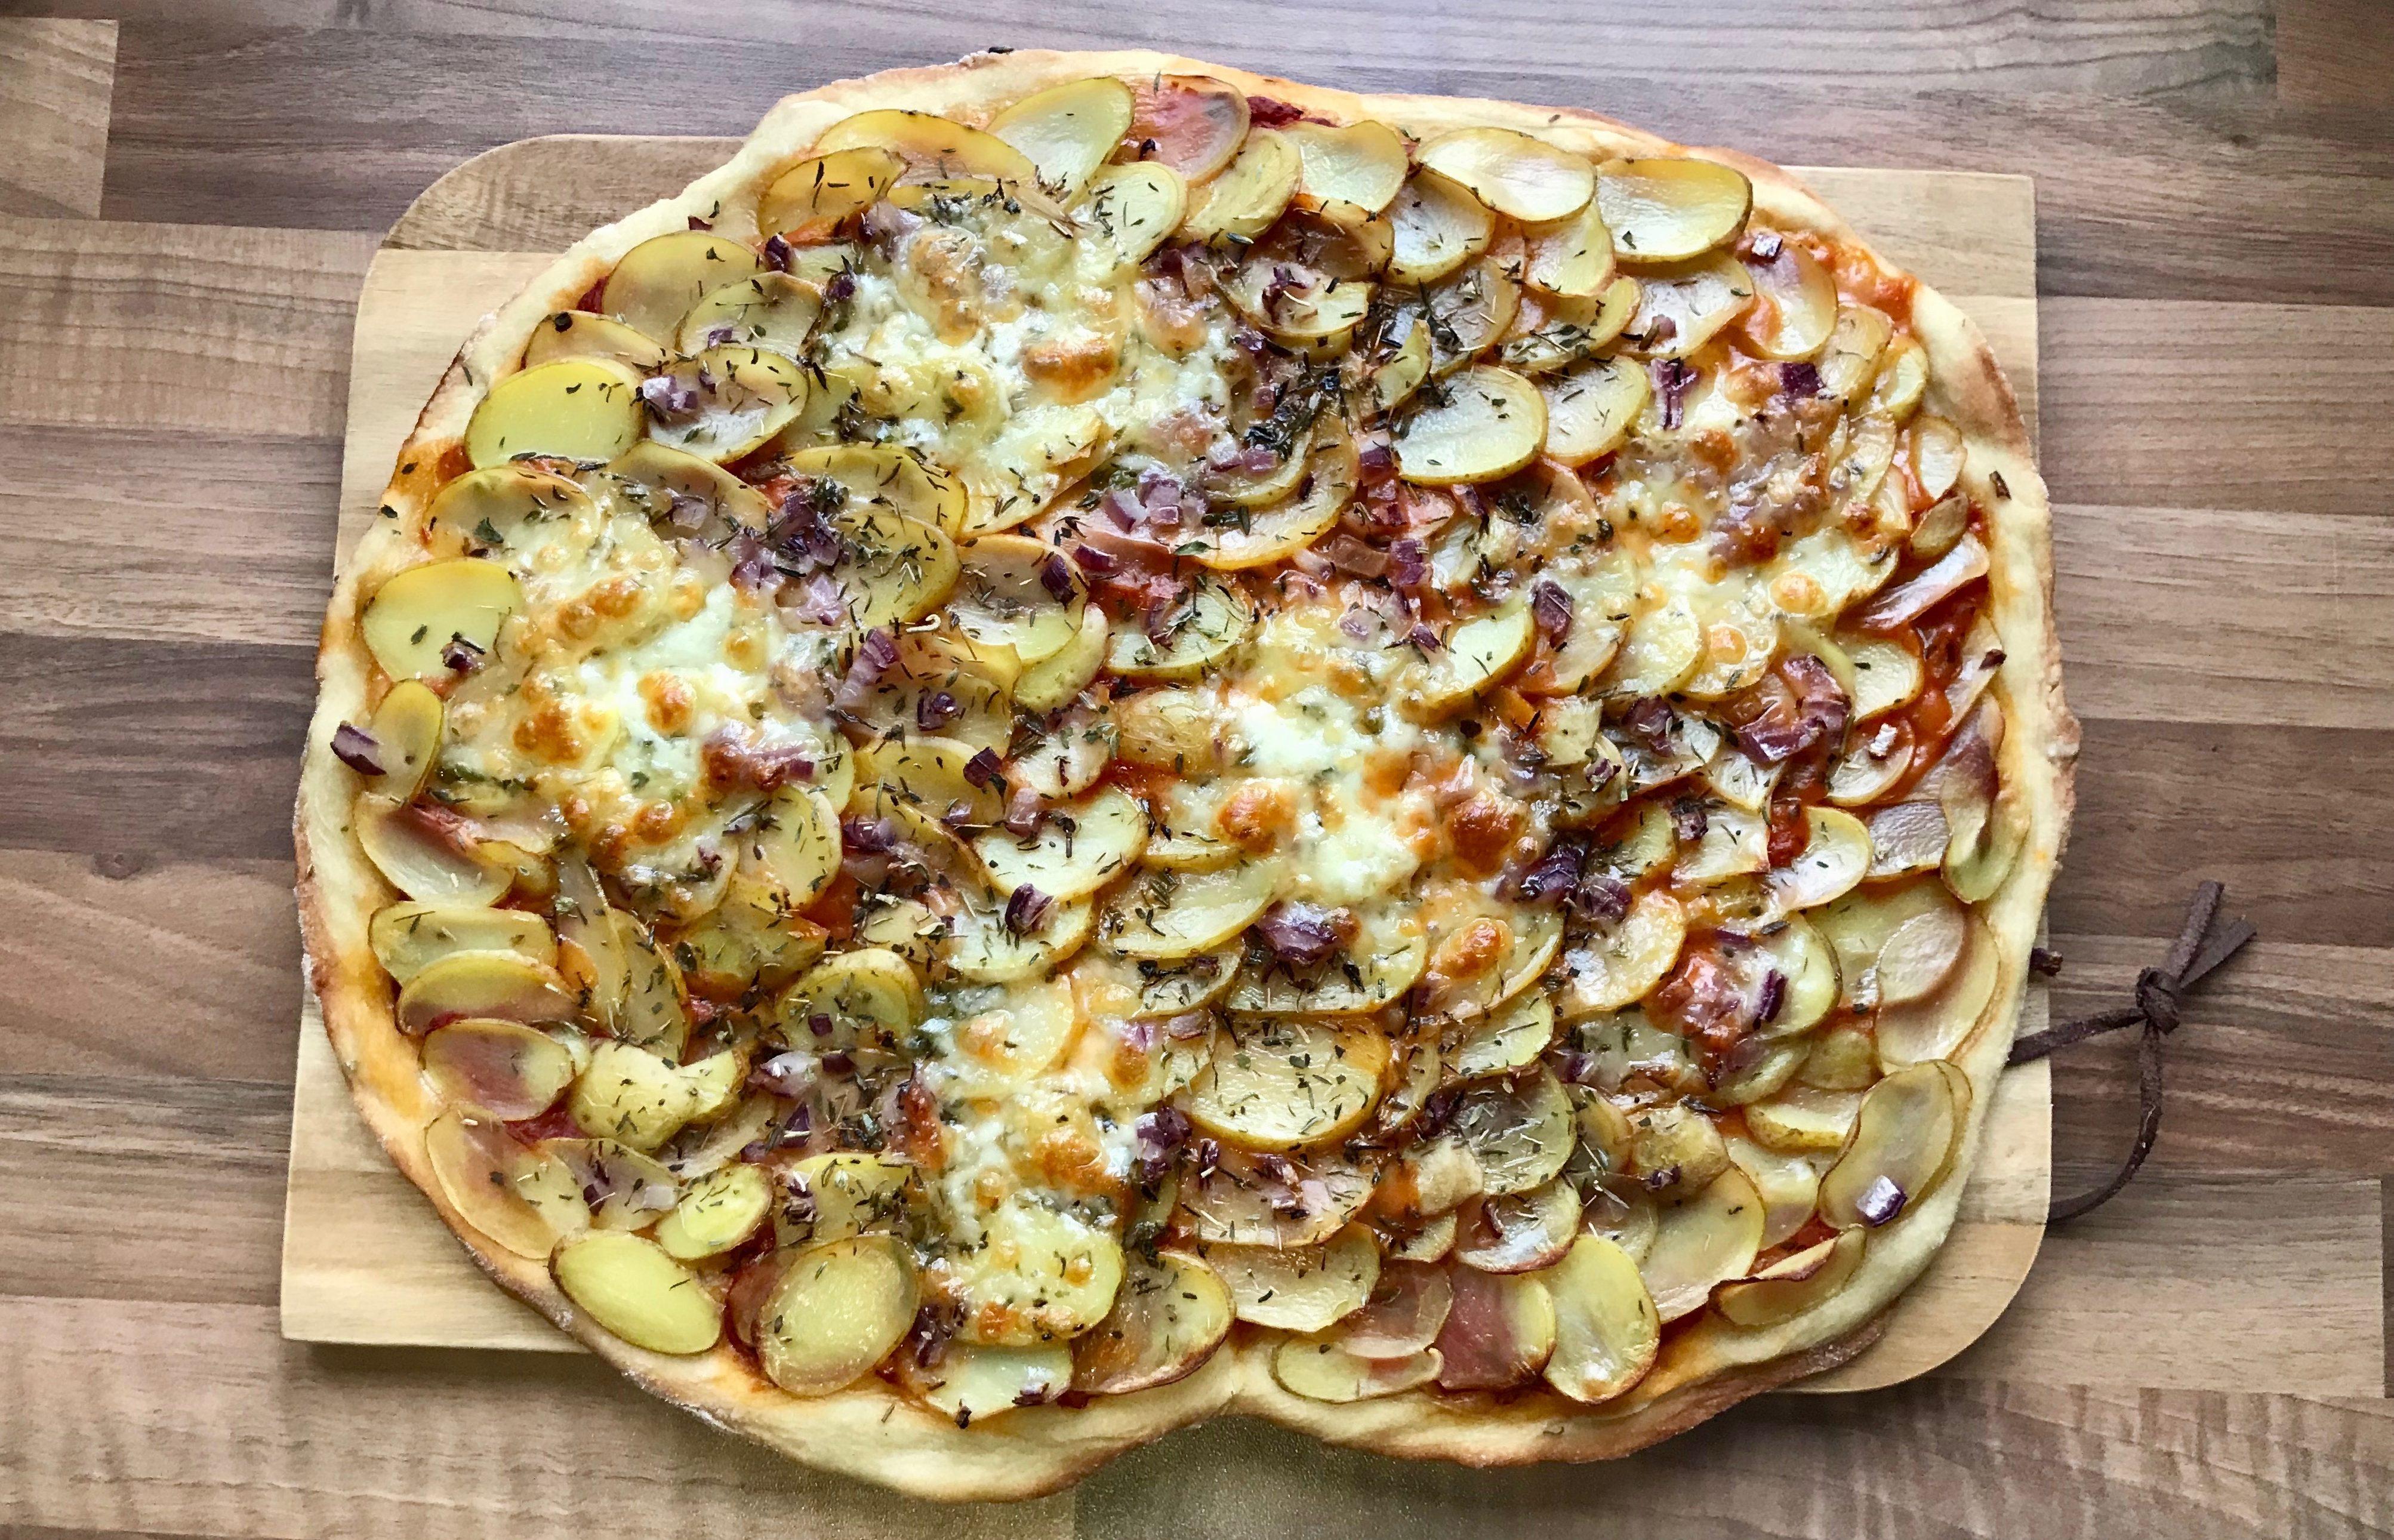 Koldhævede pizzadej